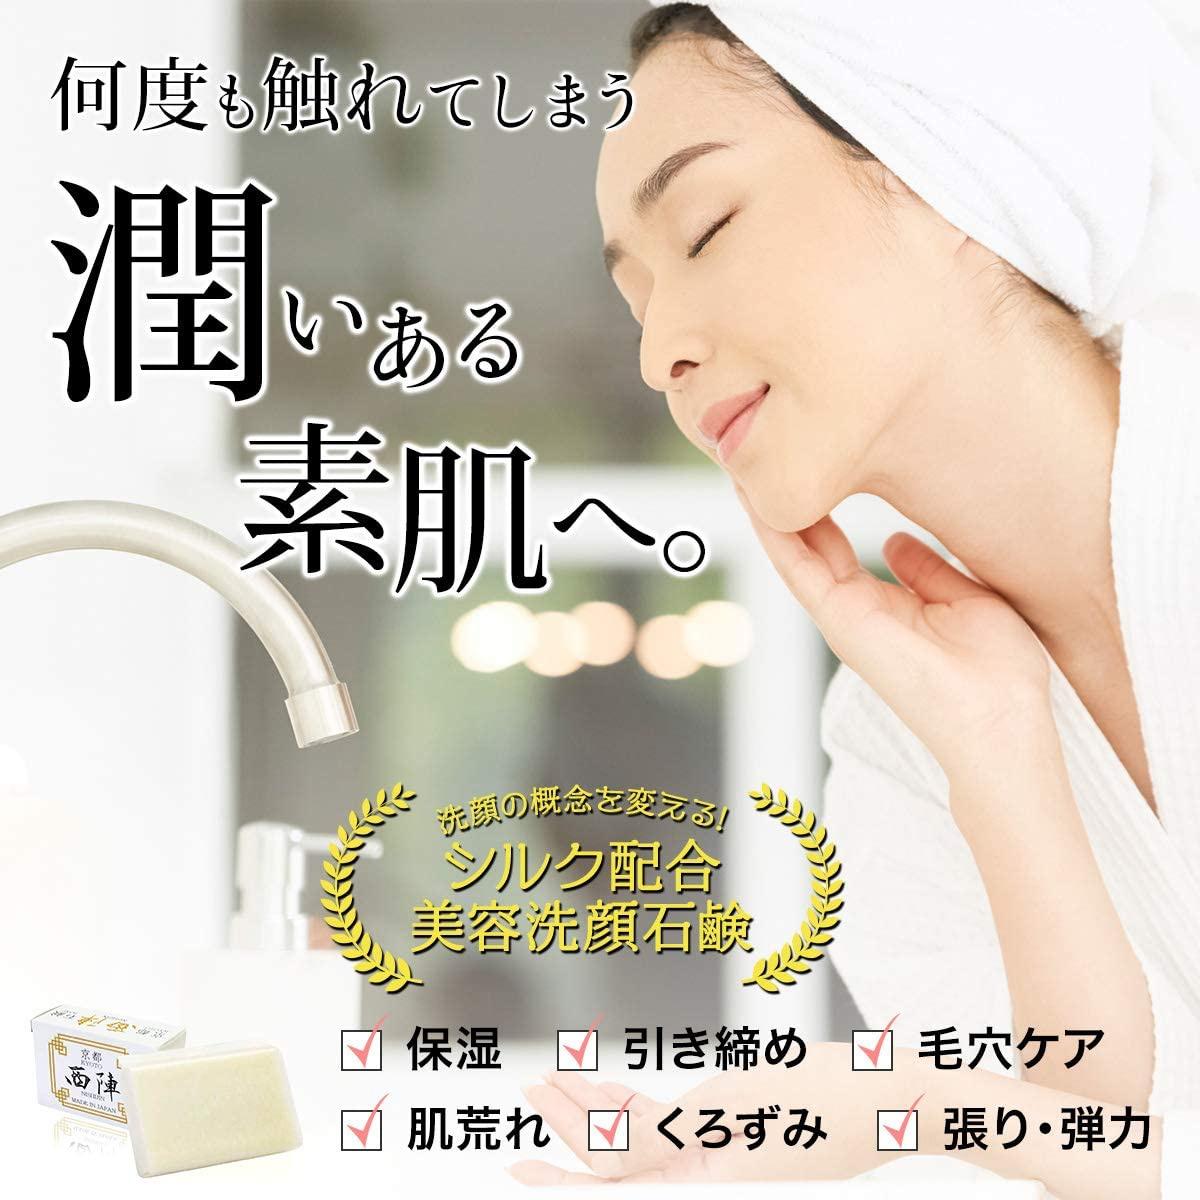 西陣石鹸(NISHIJIN SOAP) 洗顔用石鹸の商品画像4